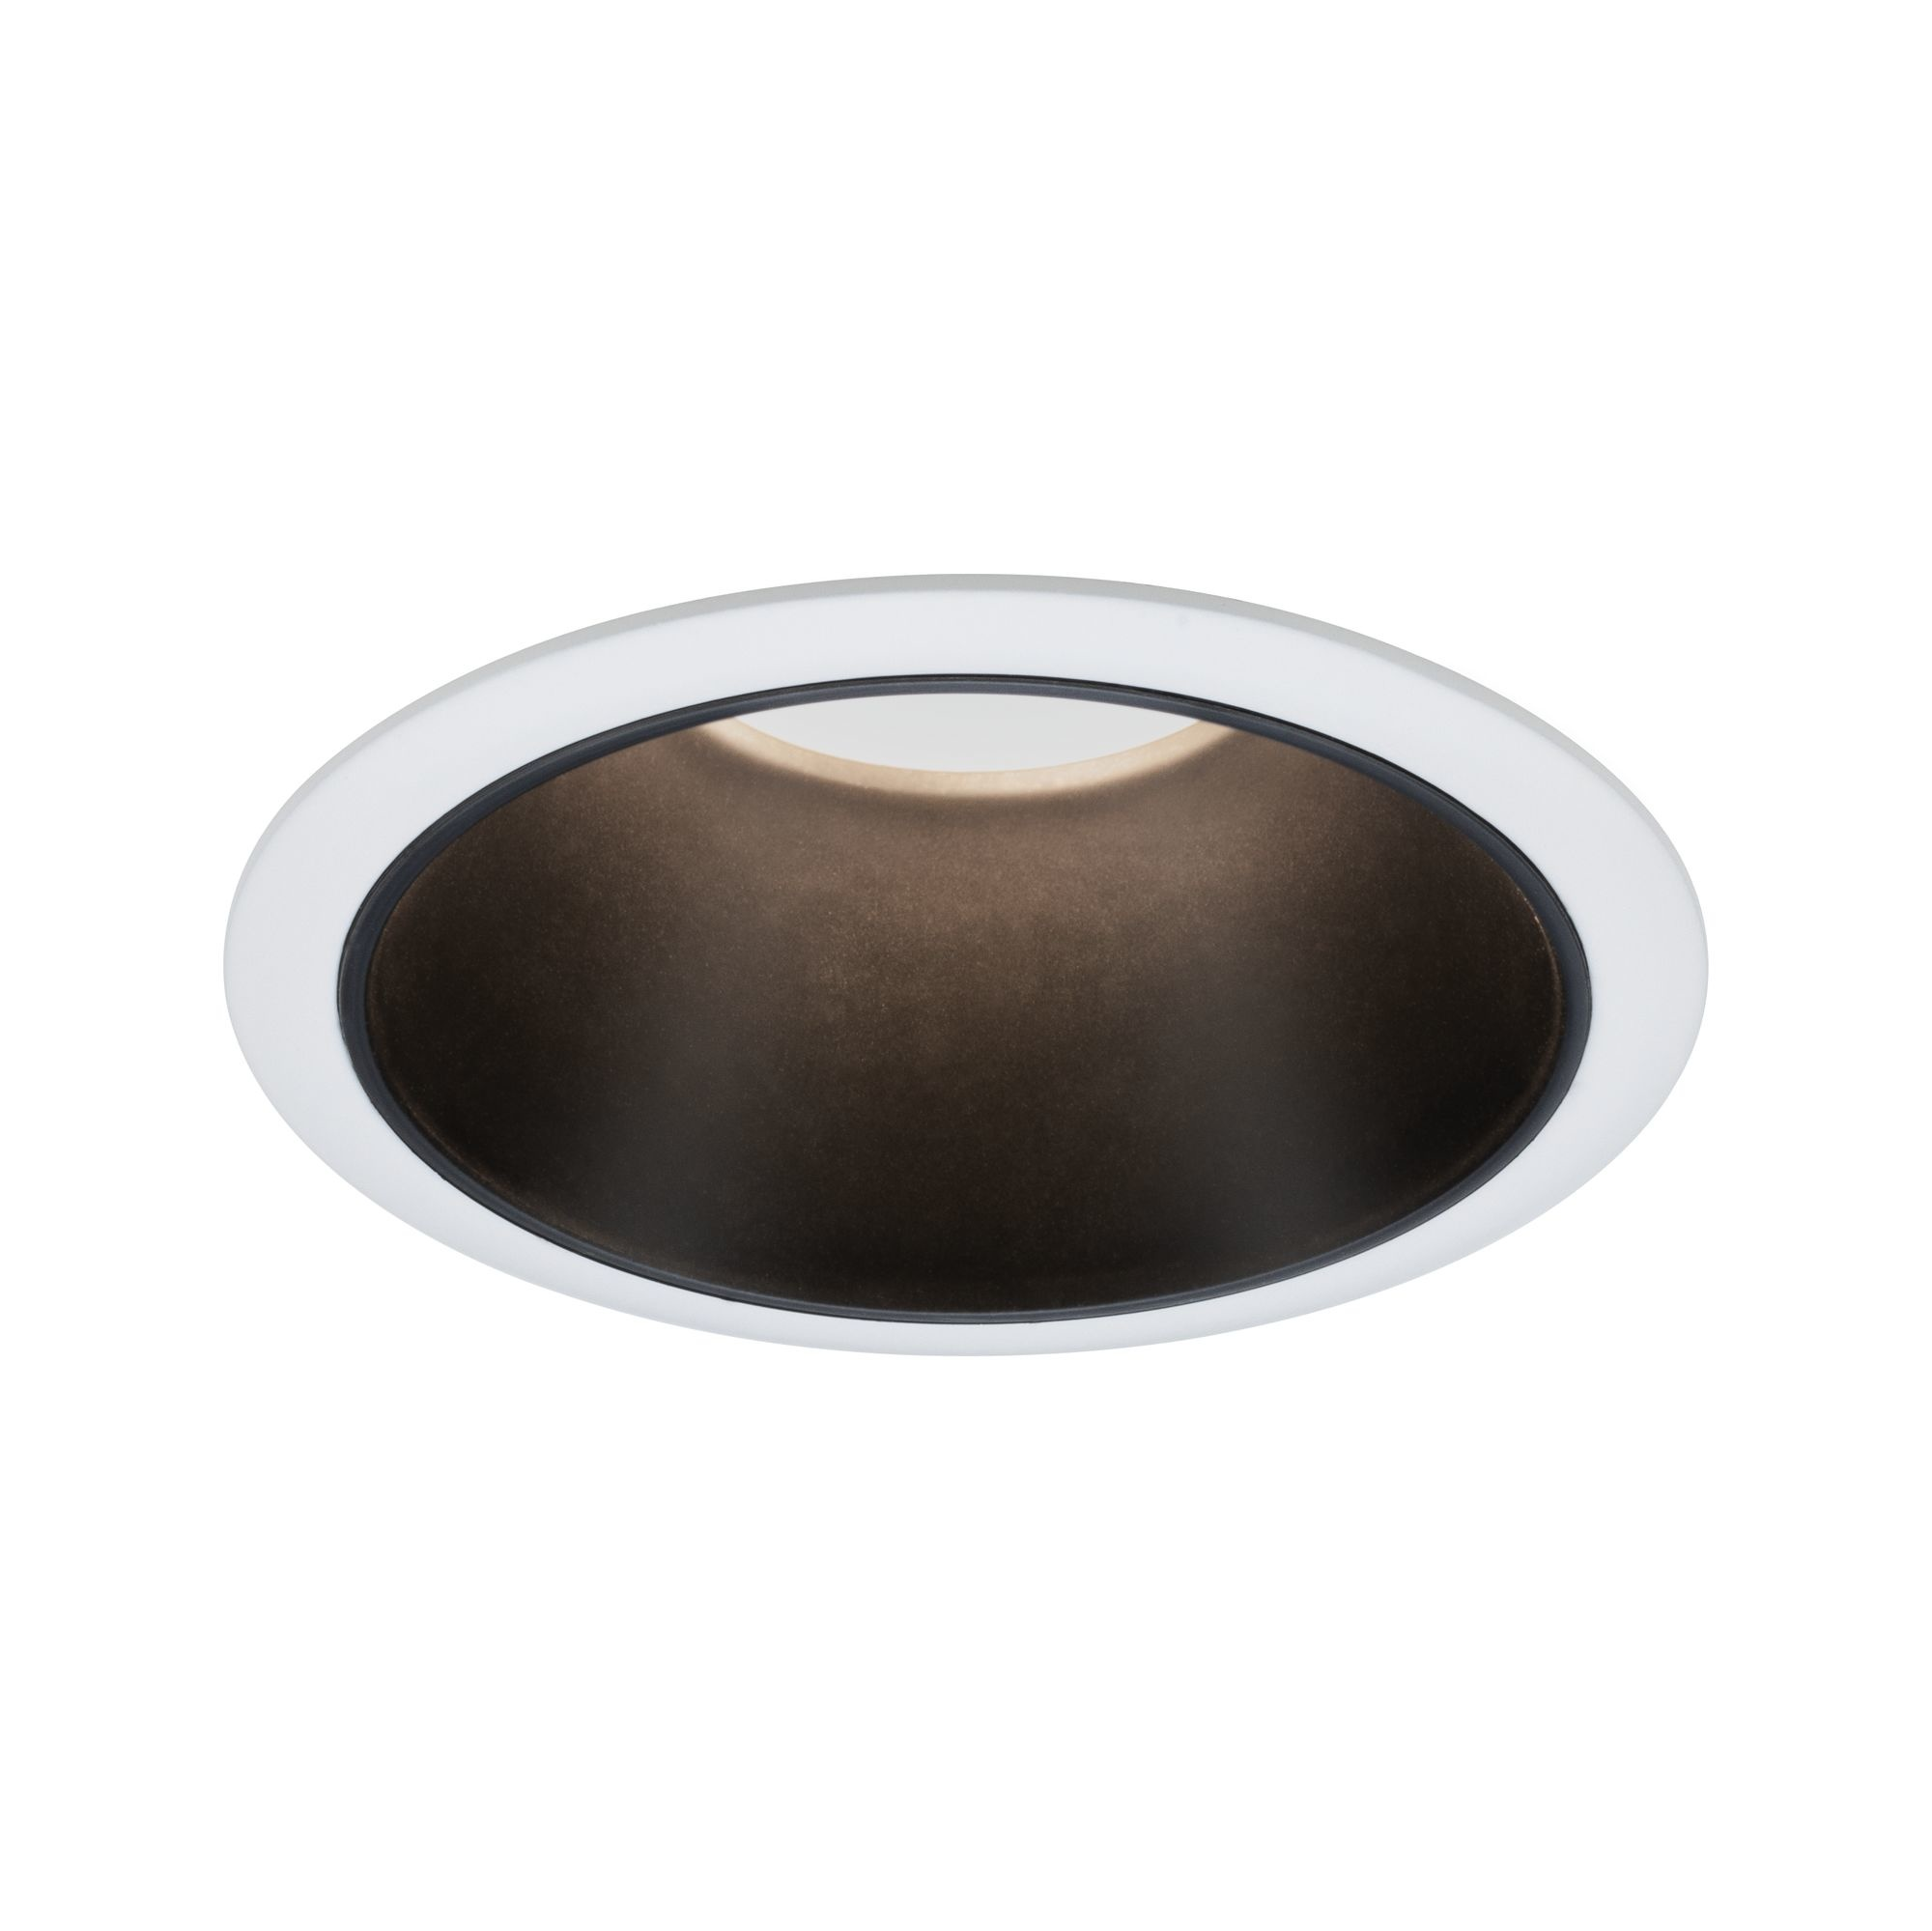 Paulmann EBL Set Cole Coin 3StepDim rd starr LED 1x6,5W 2700K 230V weiß/schwarz matt/Kst